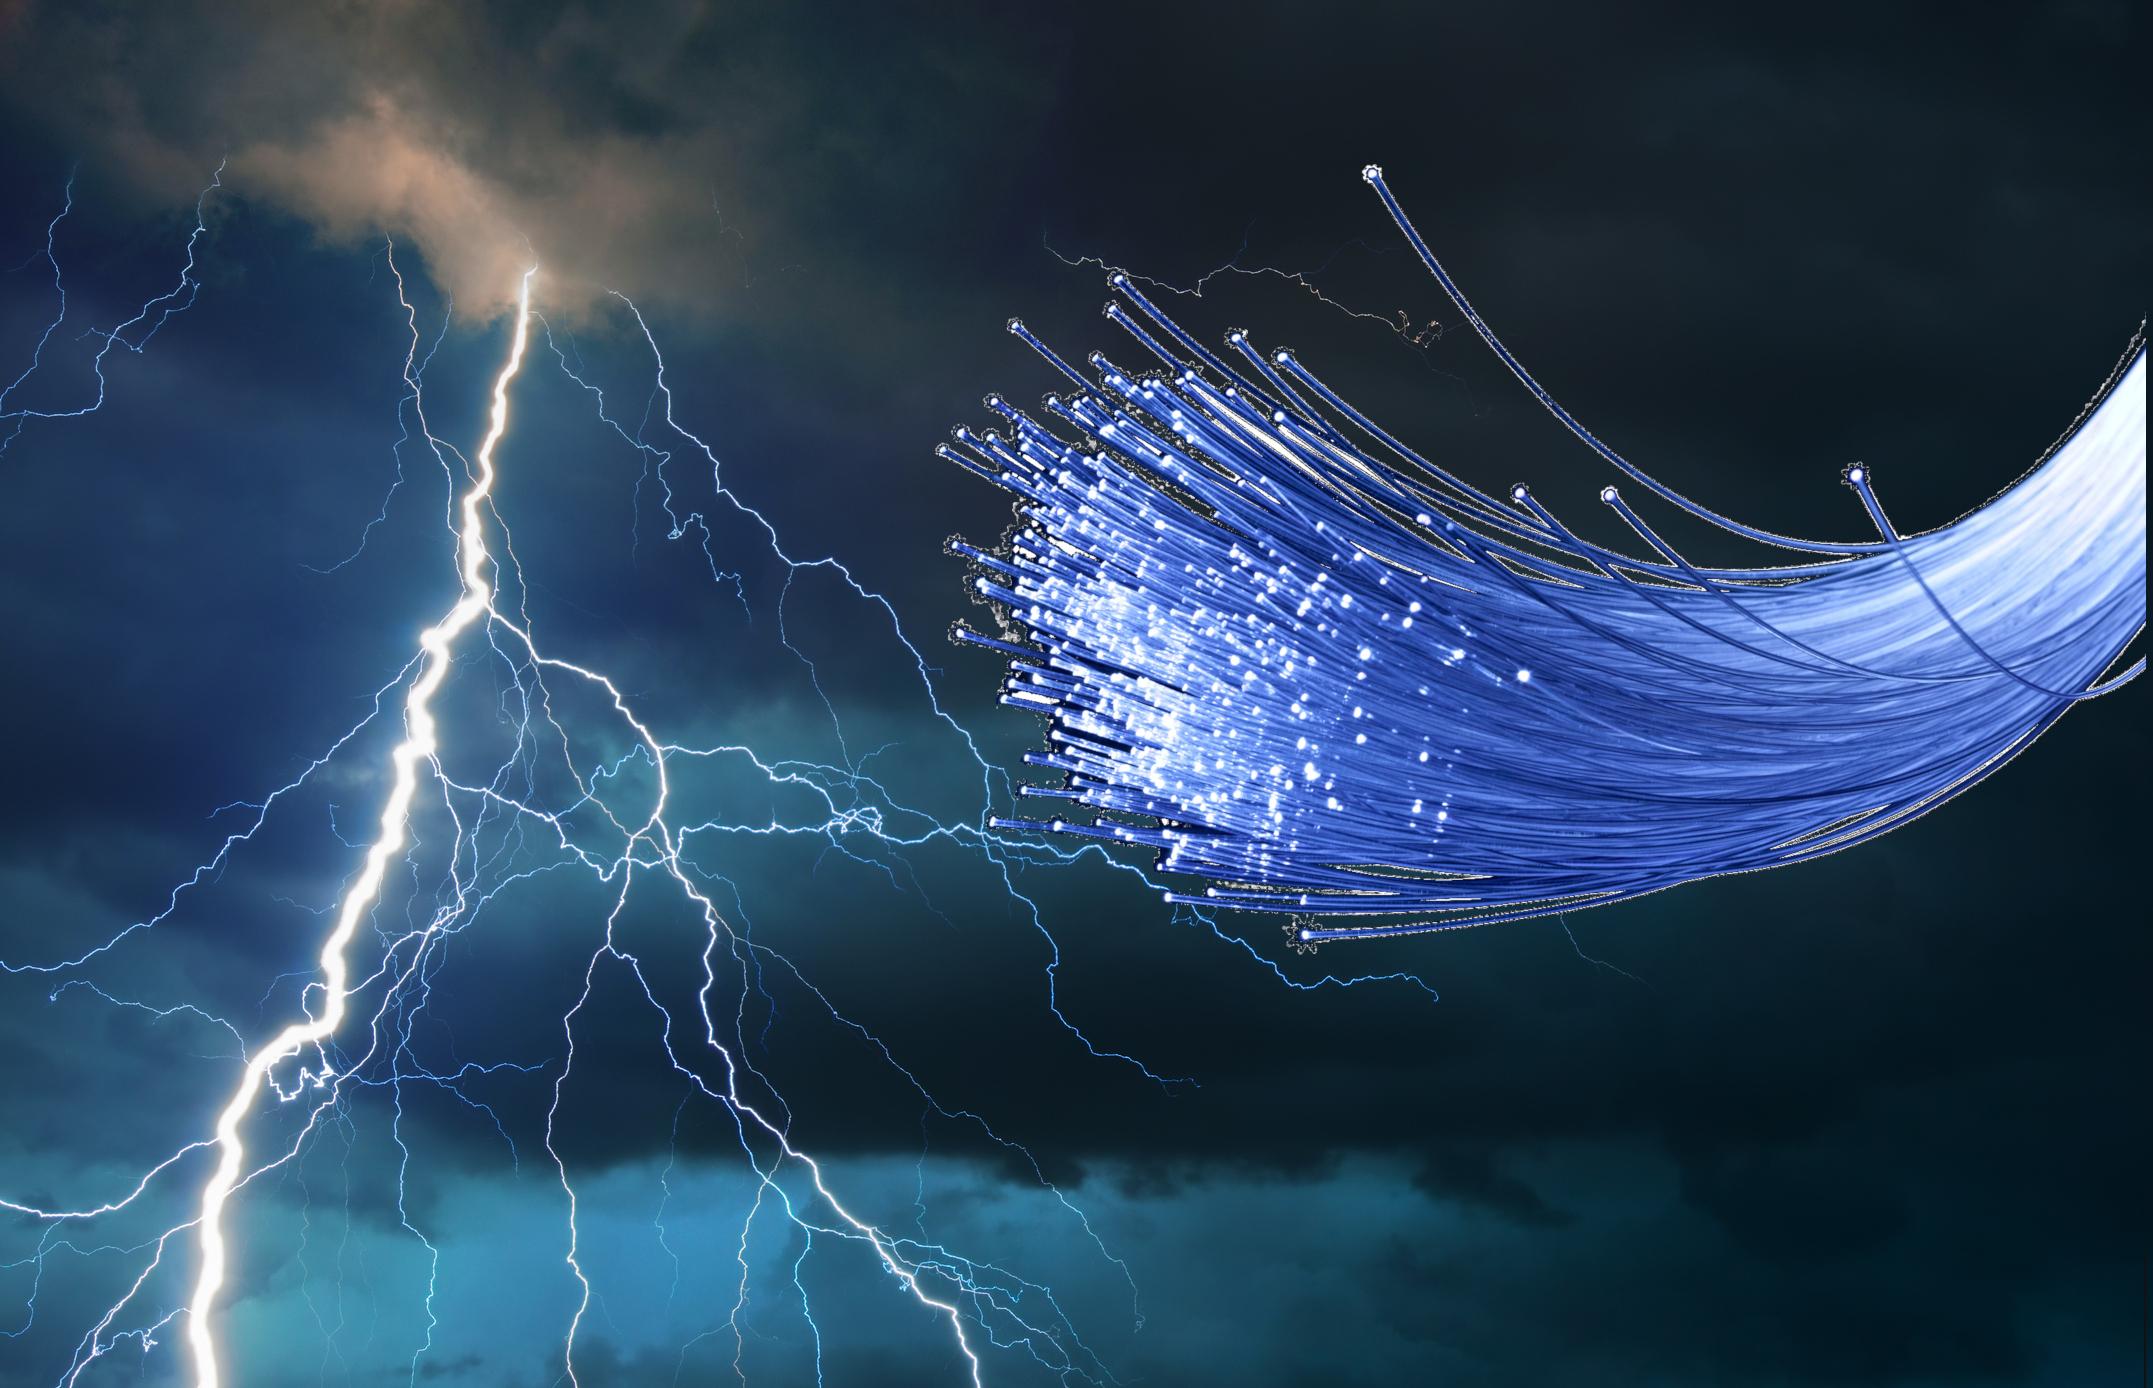 Fiber optics under dark clouds